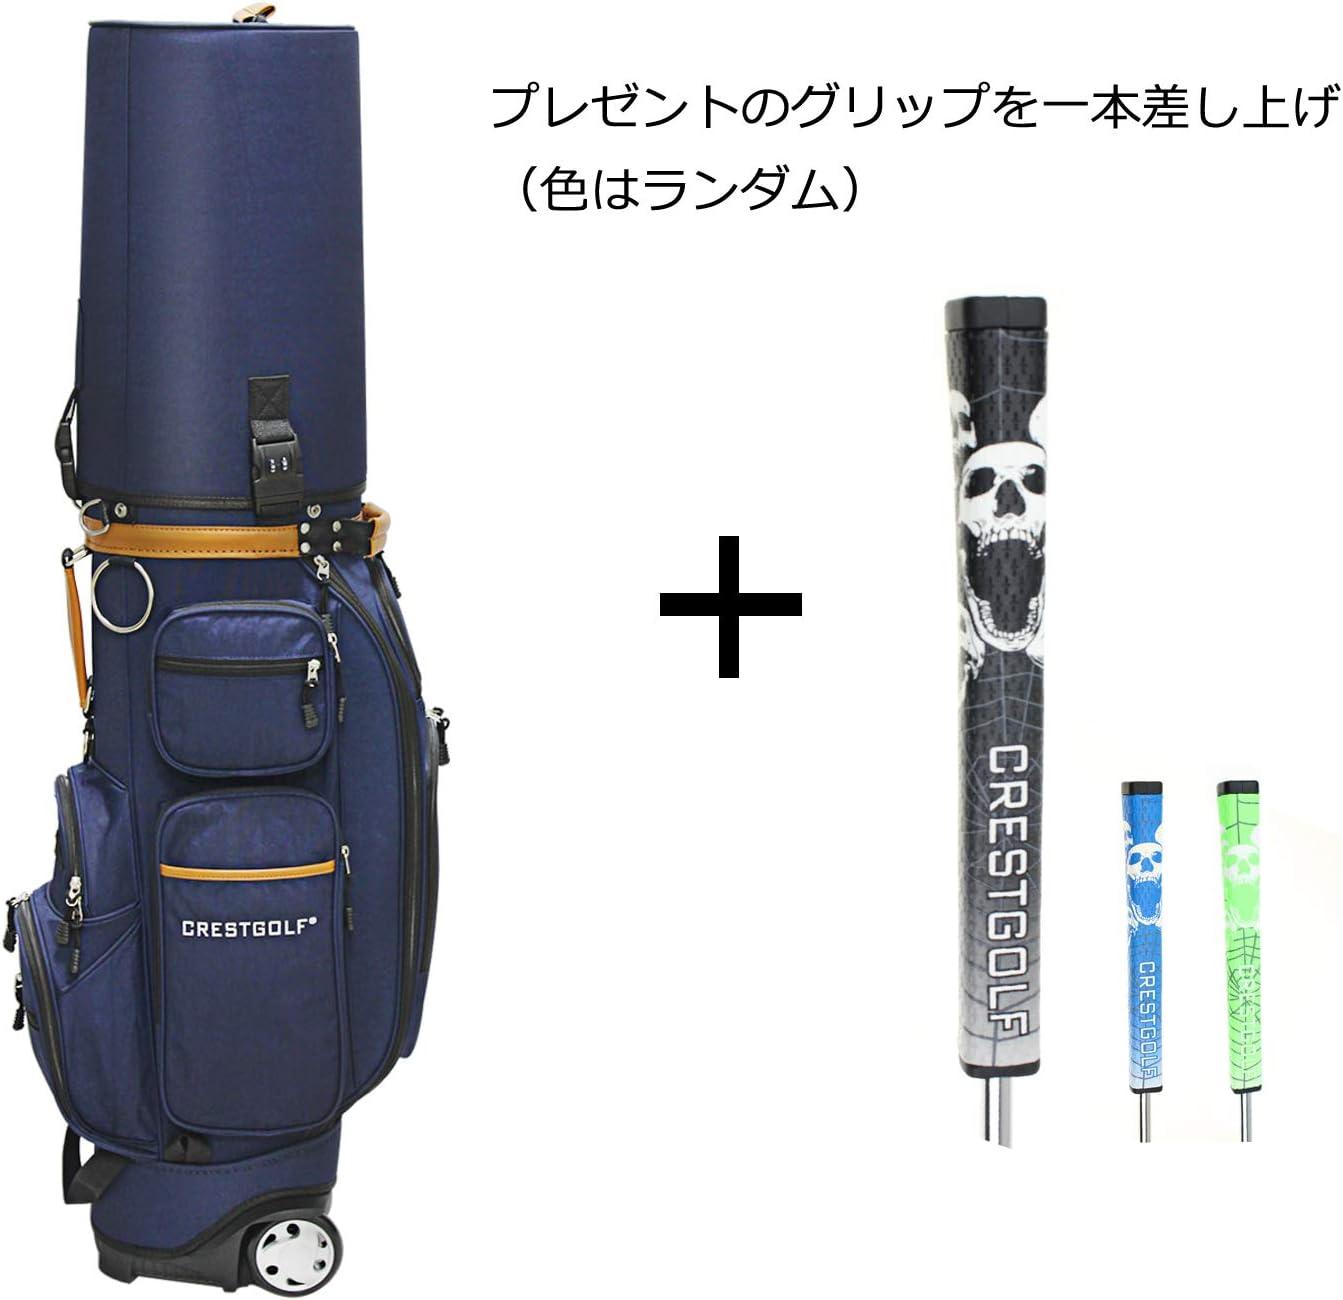 Crestgolfゴルフキャディバッグ 輪式 パスワードロック付き 恒温袋付き ポケット付き 雨カバー無料 フルセット収納 アクセサリー収納 大容量 多機能 強収納 ブルー